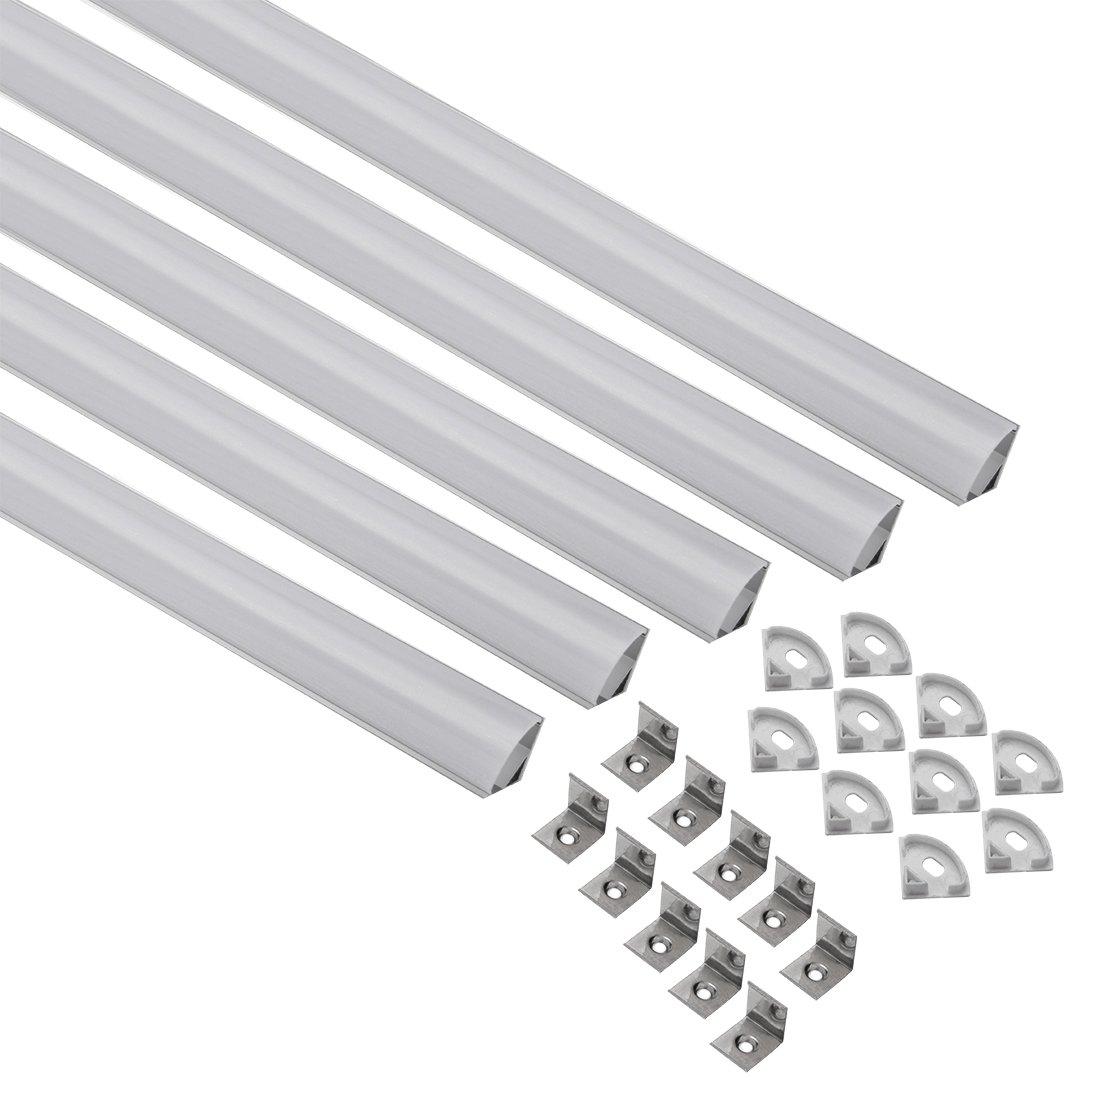 uxcell V-Shape LED Aluminum Channel System with Milky White Cover for LED Strip Light, CN601(1mx15.8mmx15.8mm) - 5 Packs